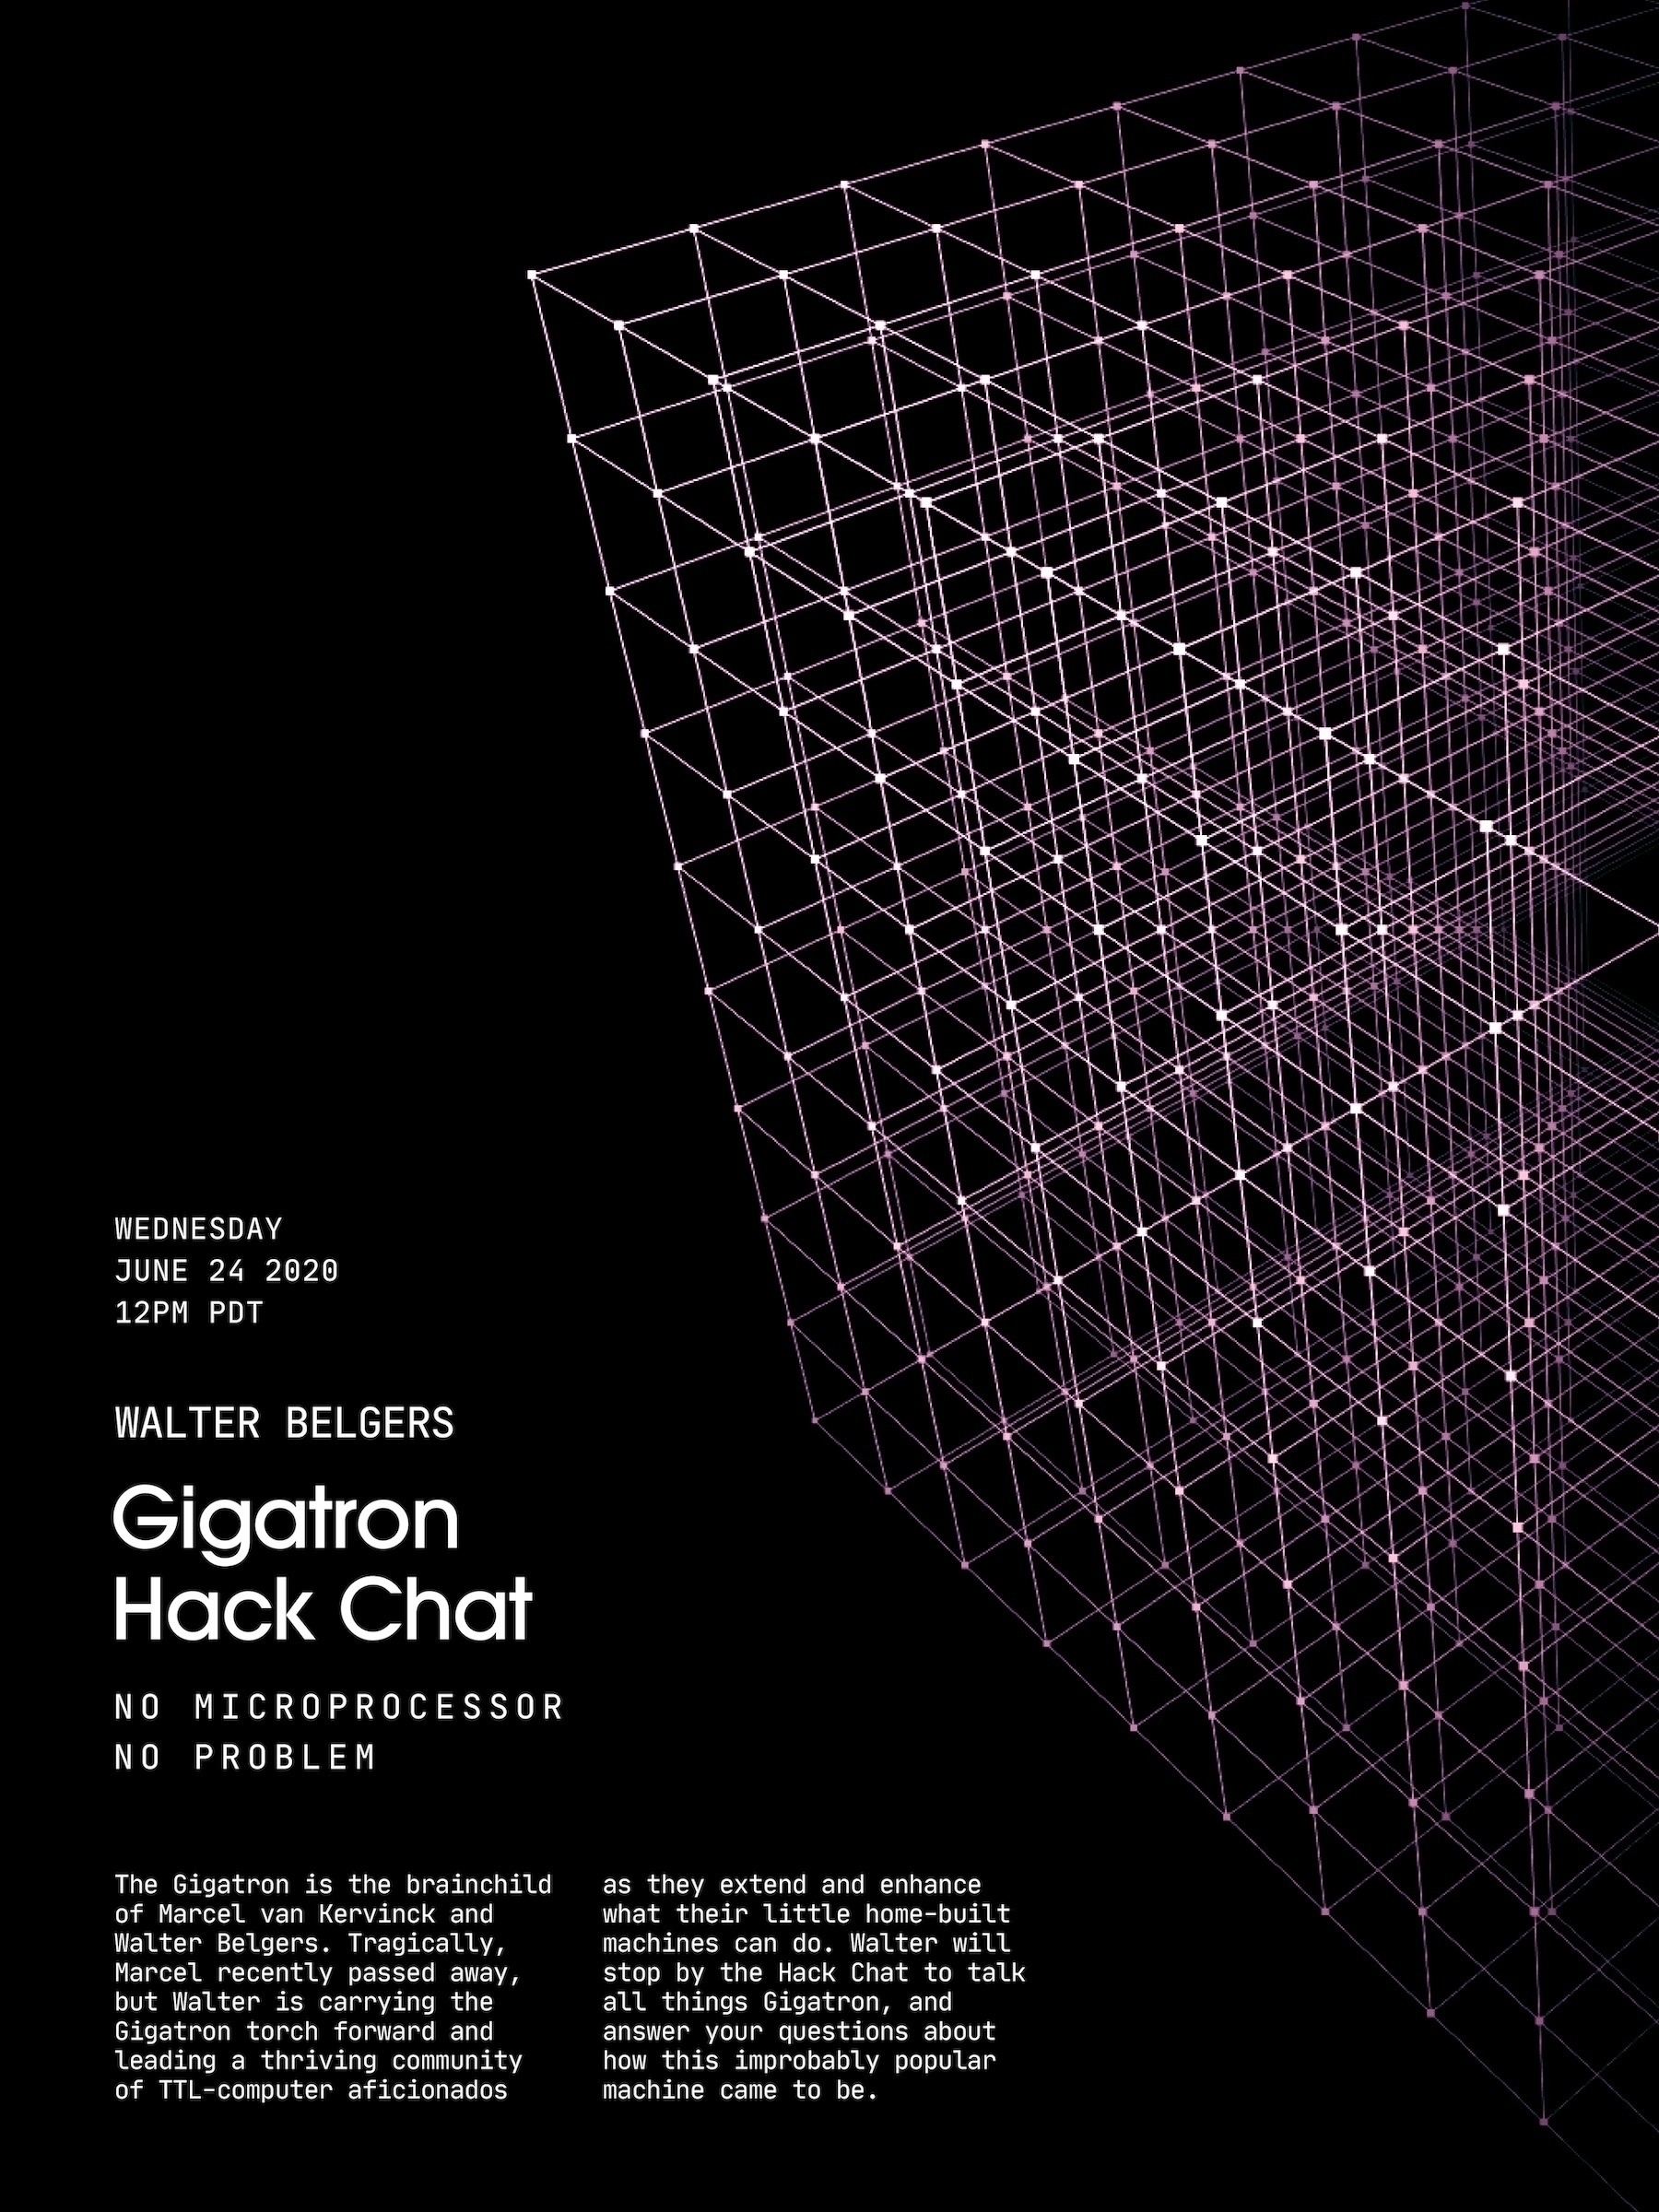 Gigatron HackChat - poster, design - randomwalks | ello